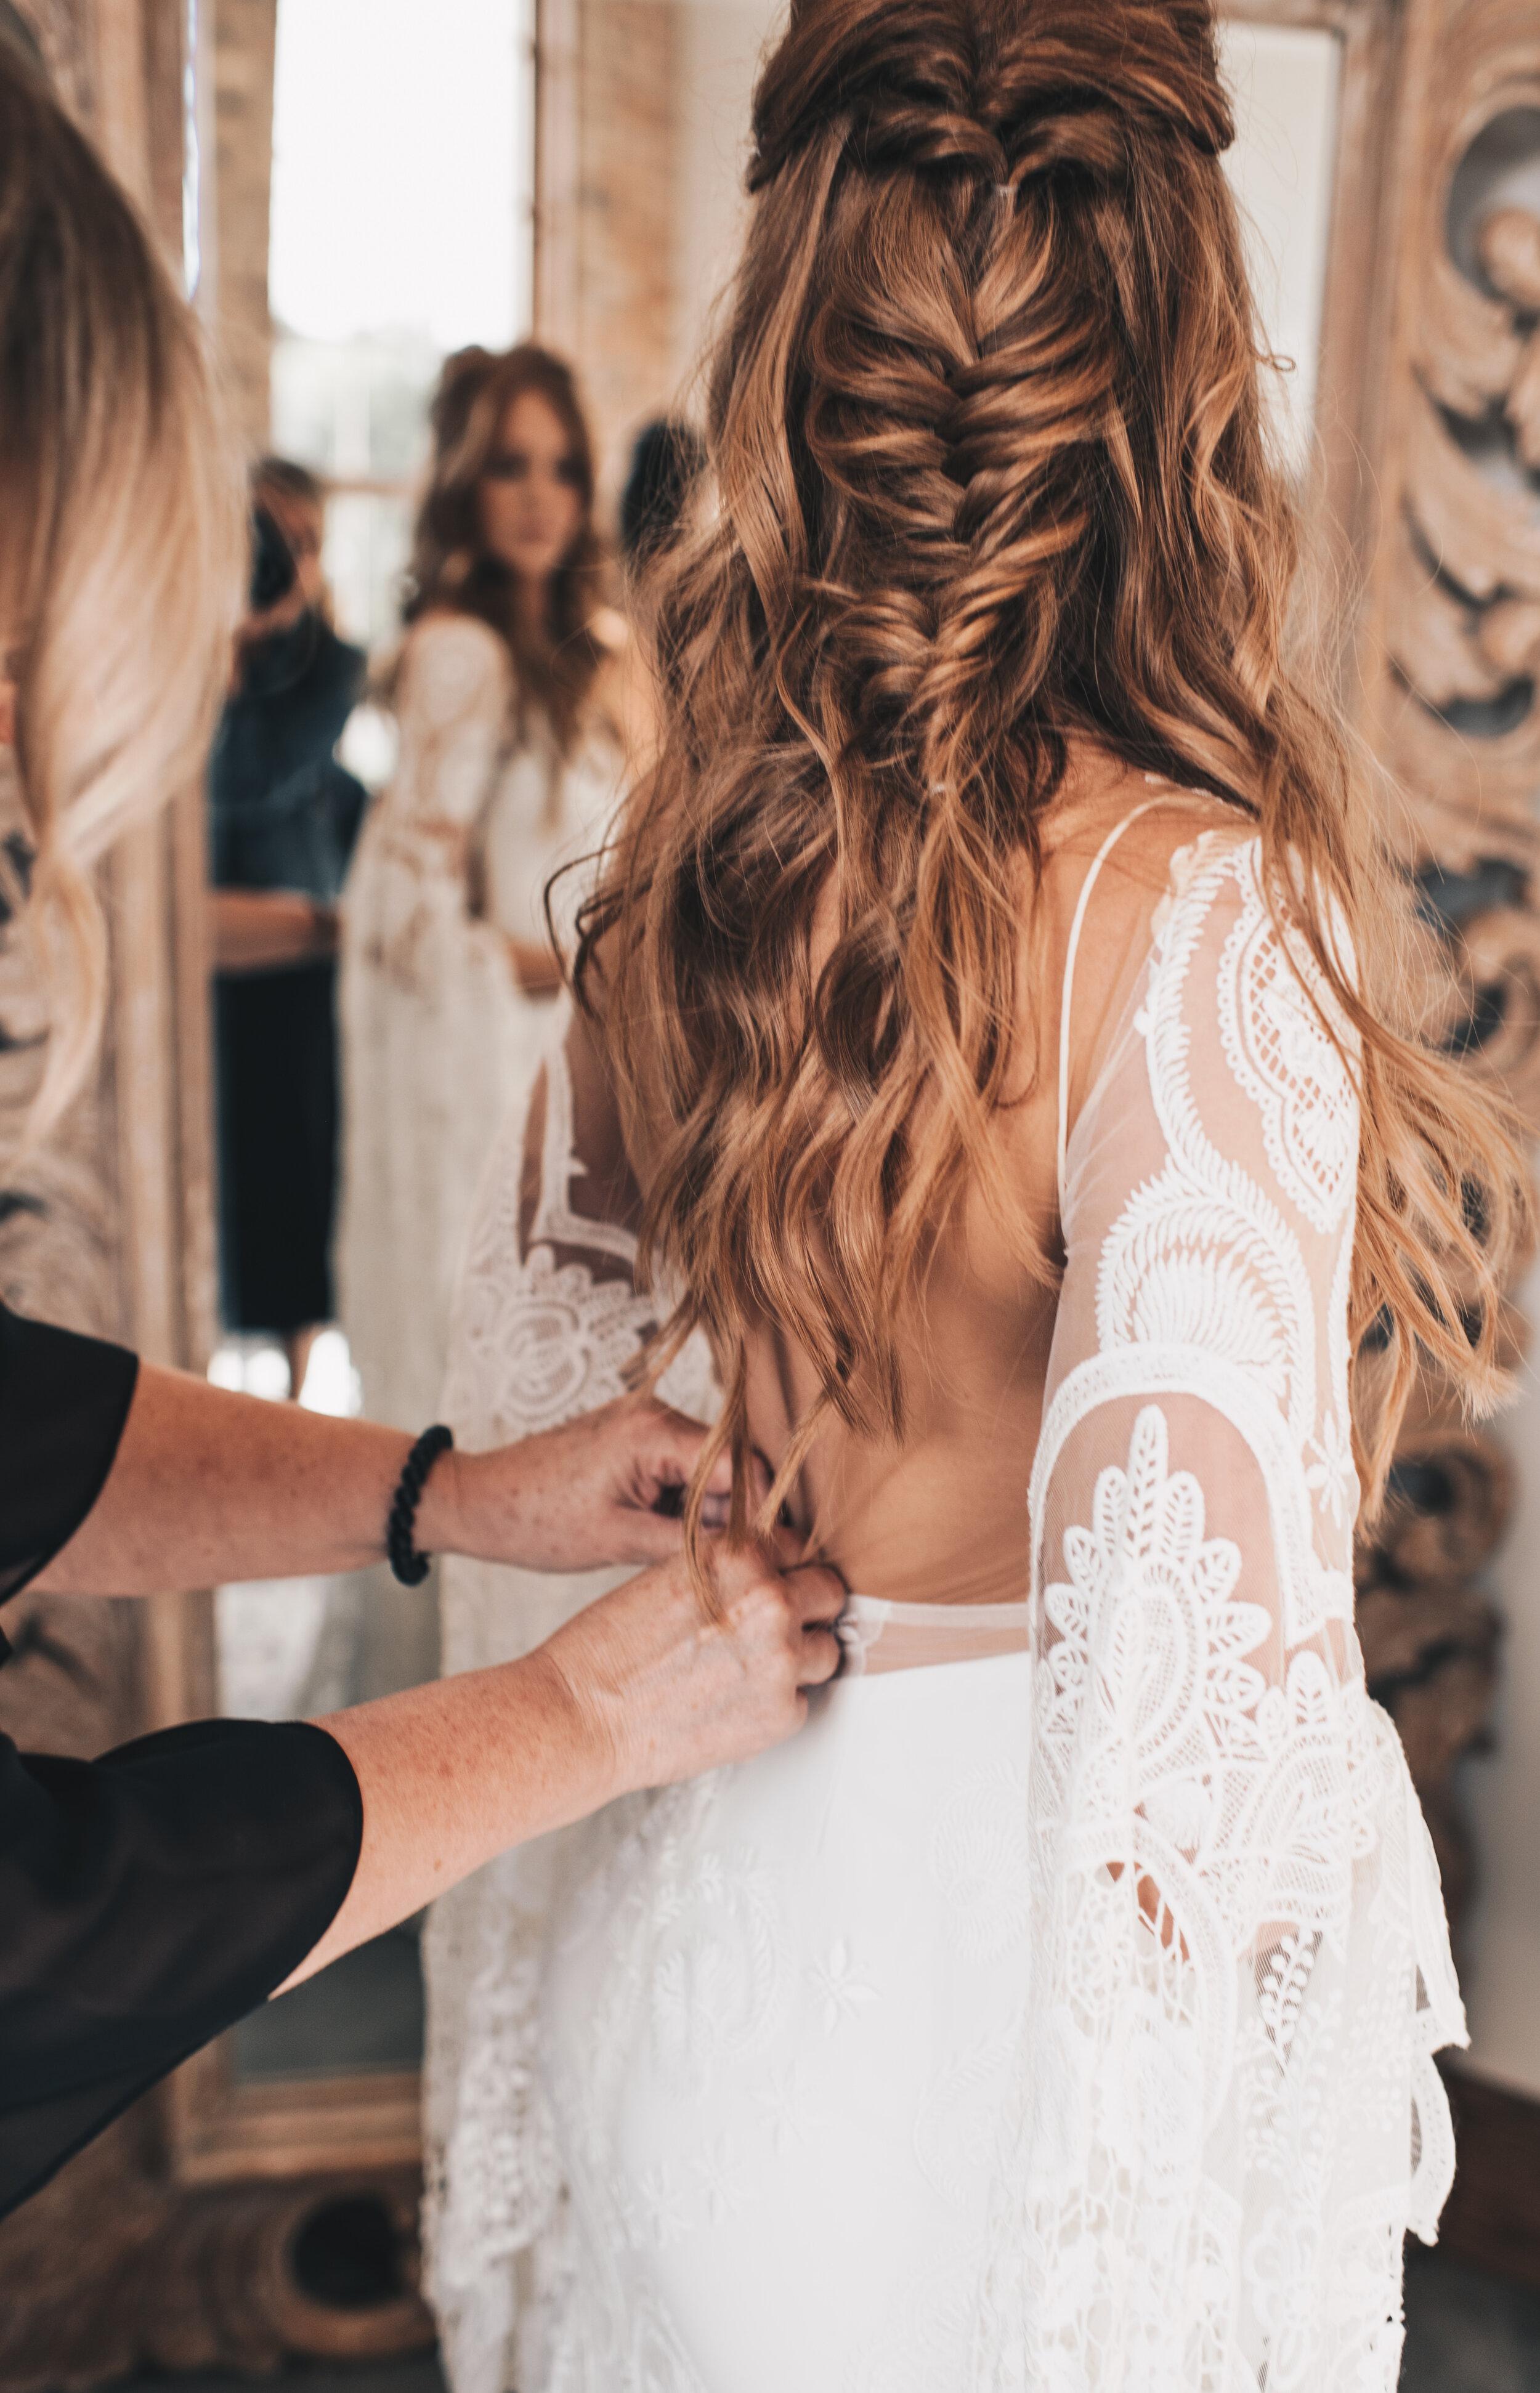 Modern Industrial Wedding, The Brix on the Fox, The BRIX, Wedding Detail Photos, Modern Midwest Wedding, The Brix on the Fox Wedding, The BRIX Wedding, Bride Getting Ready Photos